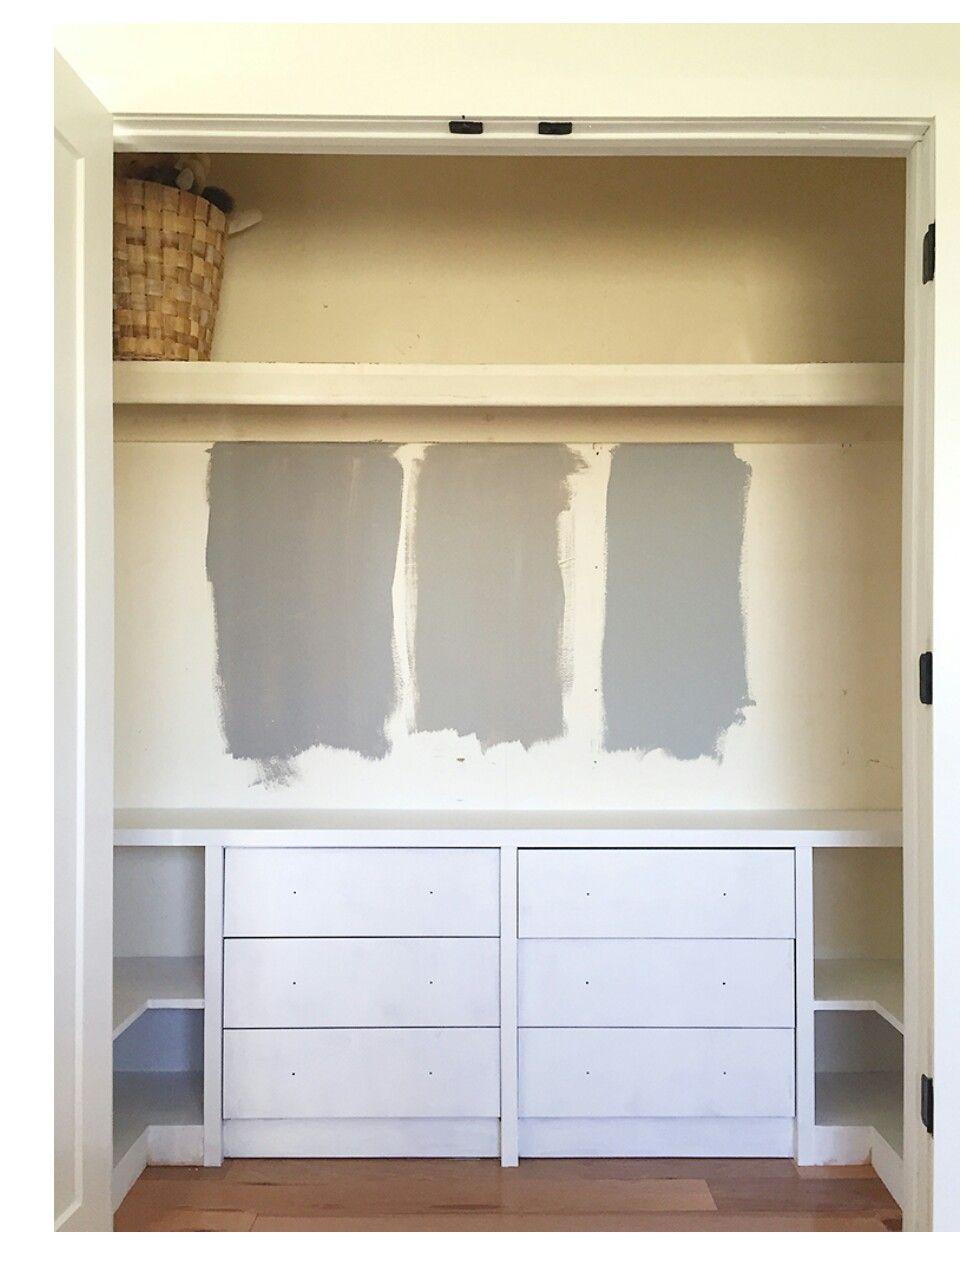 Rustic Ikea Drawers For Closet Build A Closet Closet Built Ins